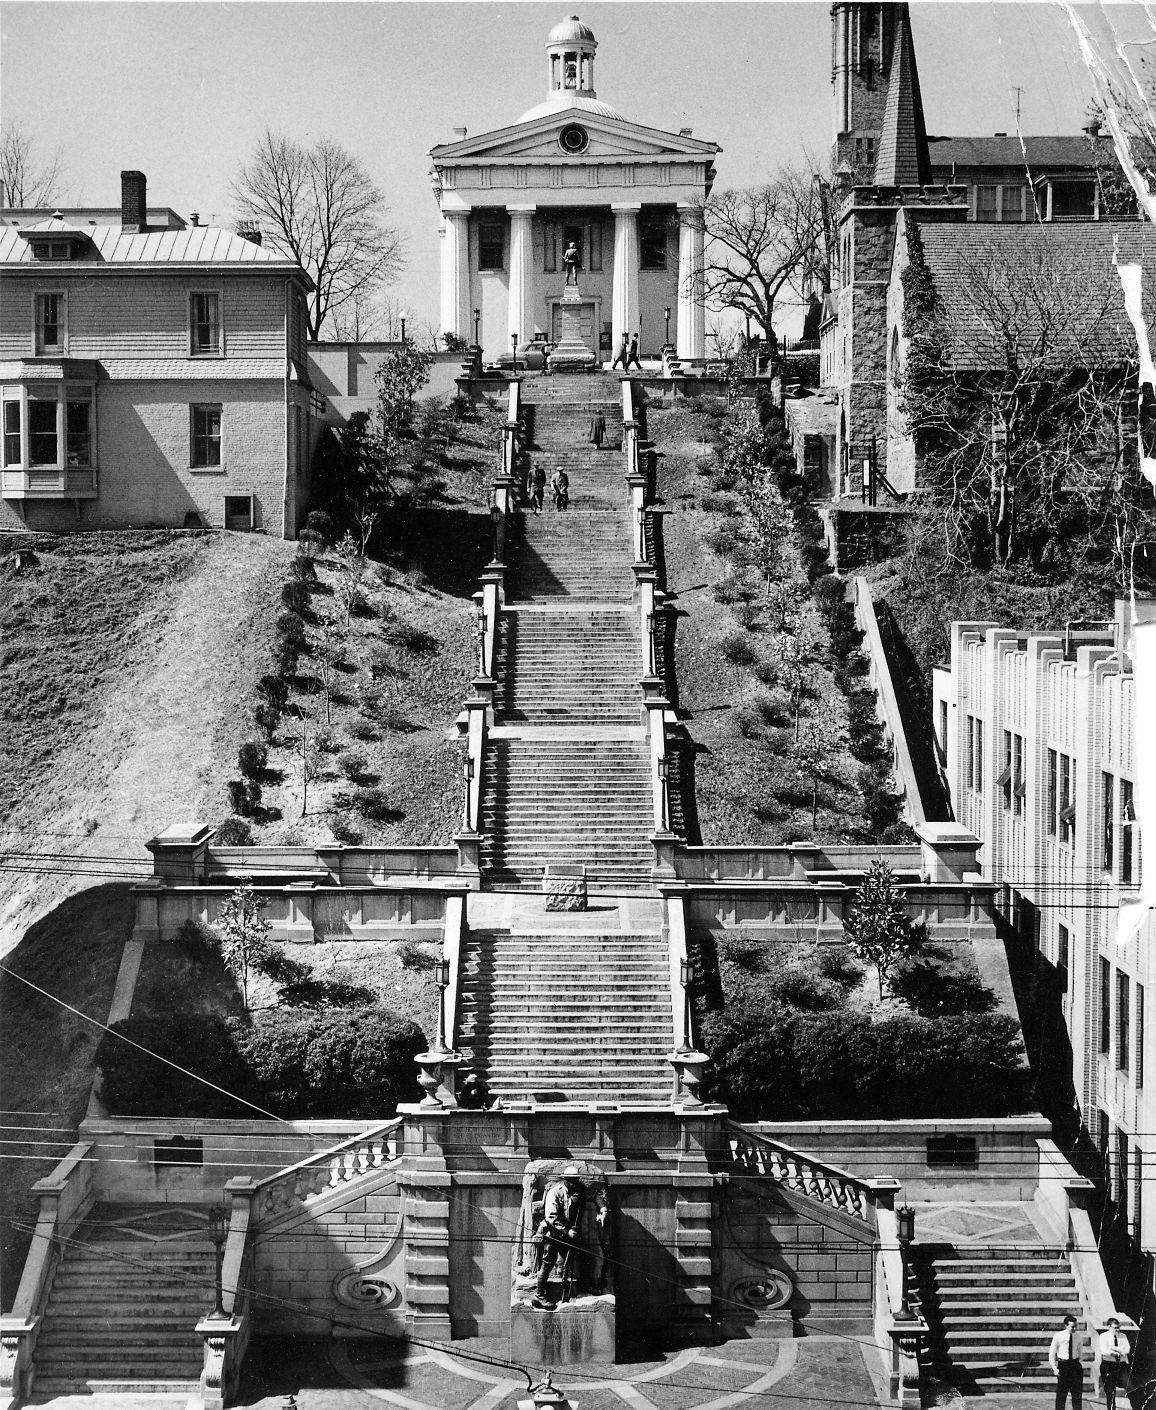 Monument Terrace: Lynchburg's Enduring Pledge Of